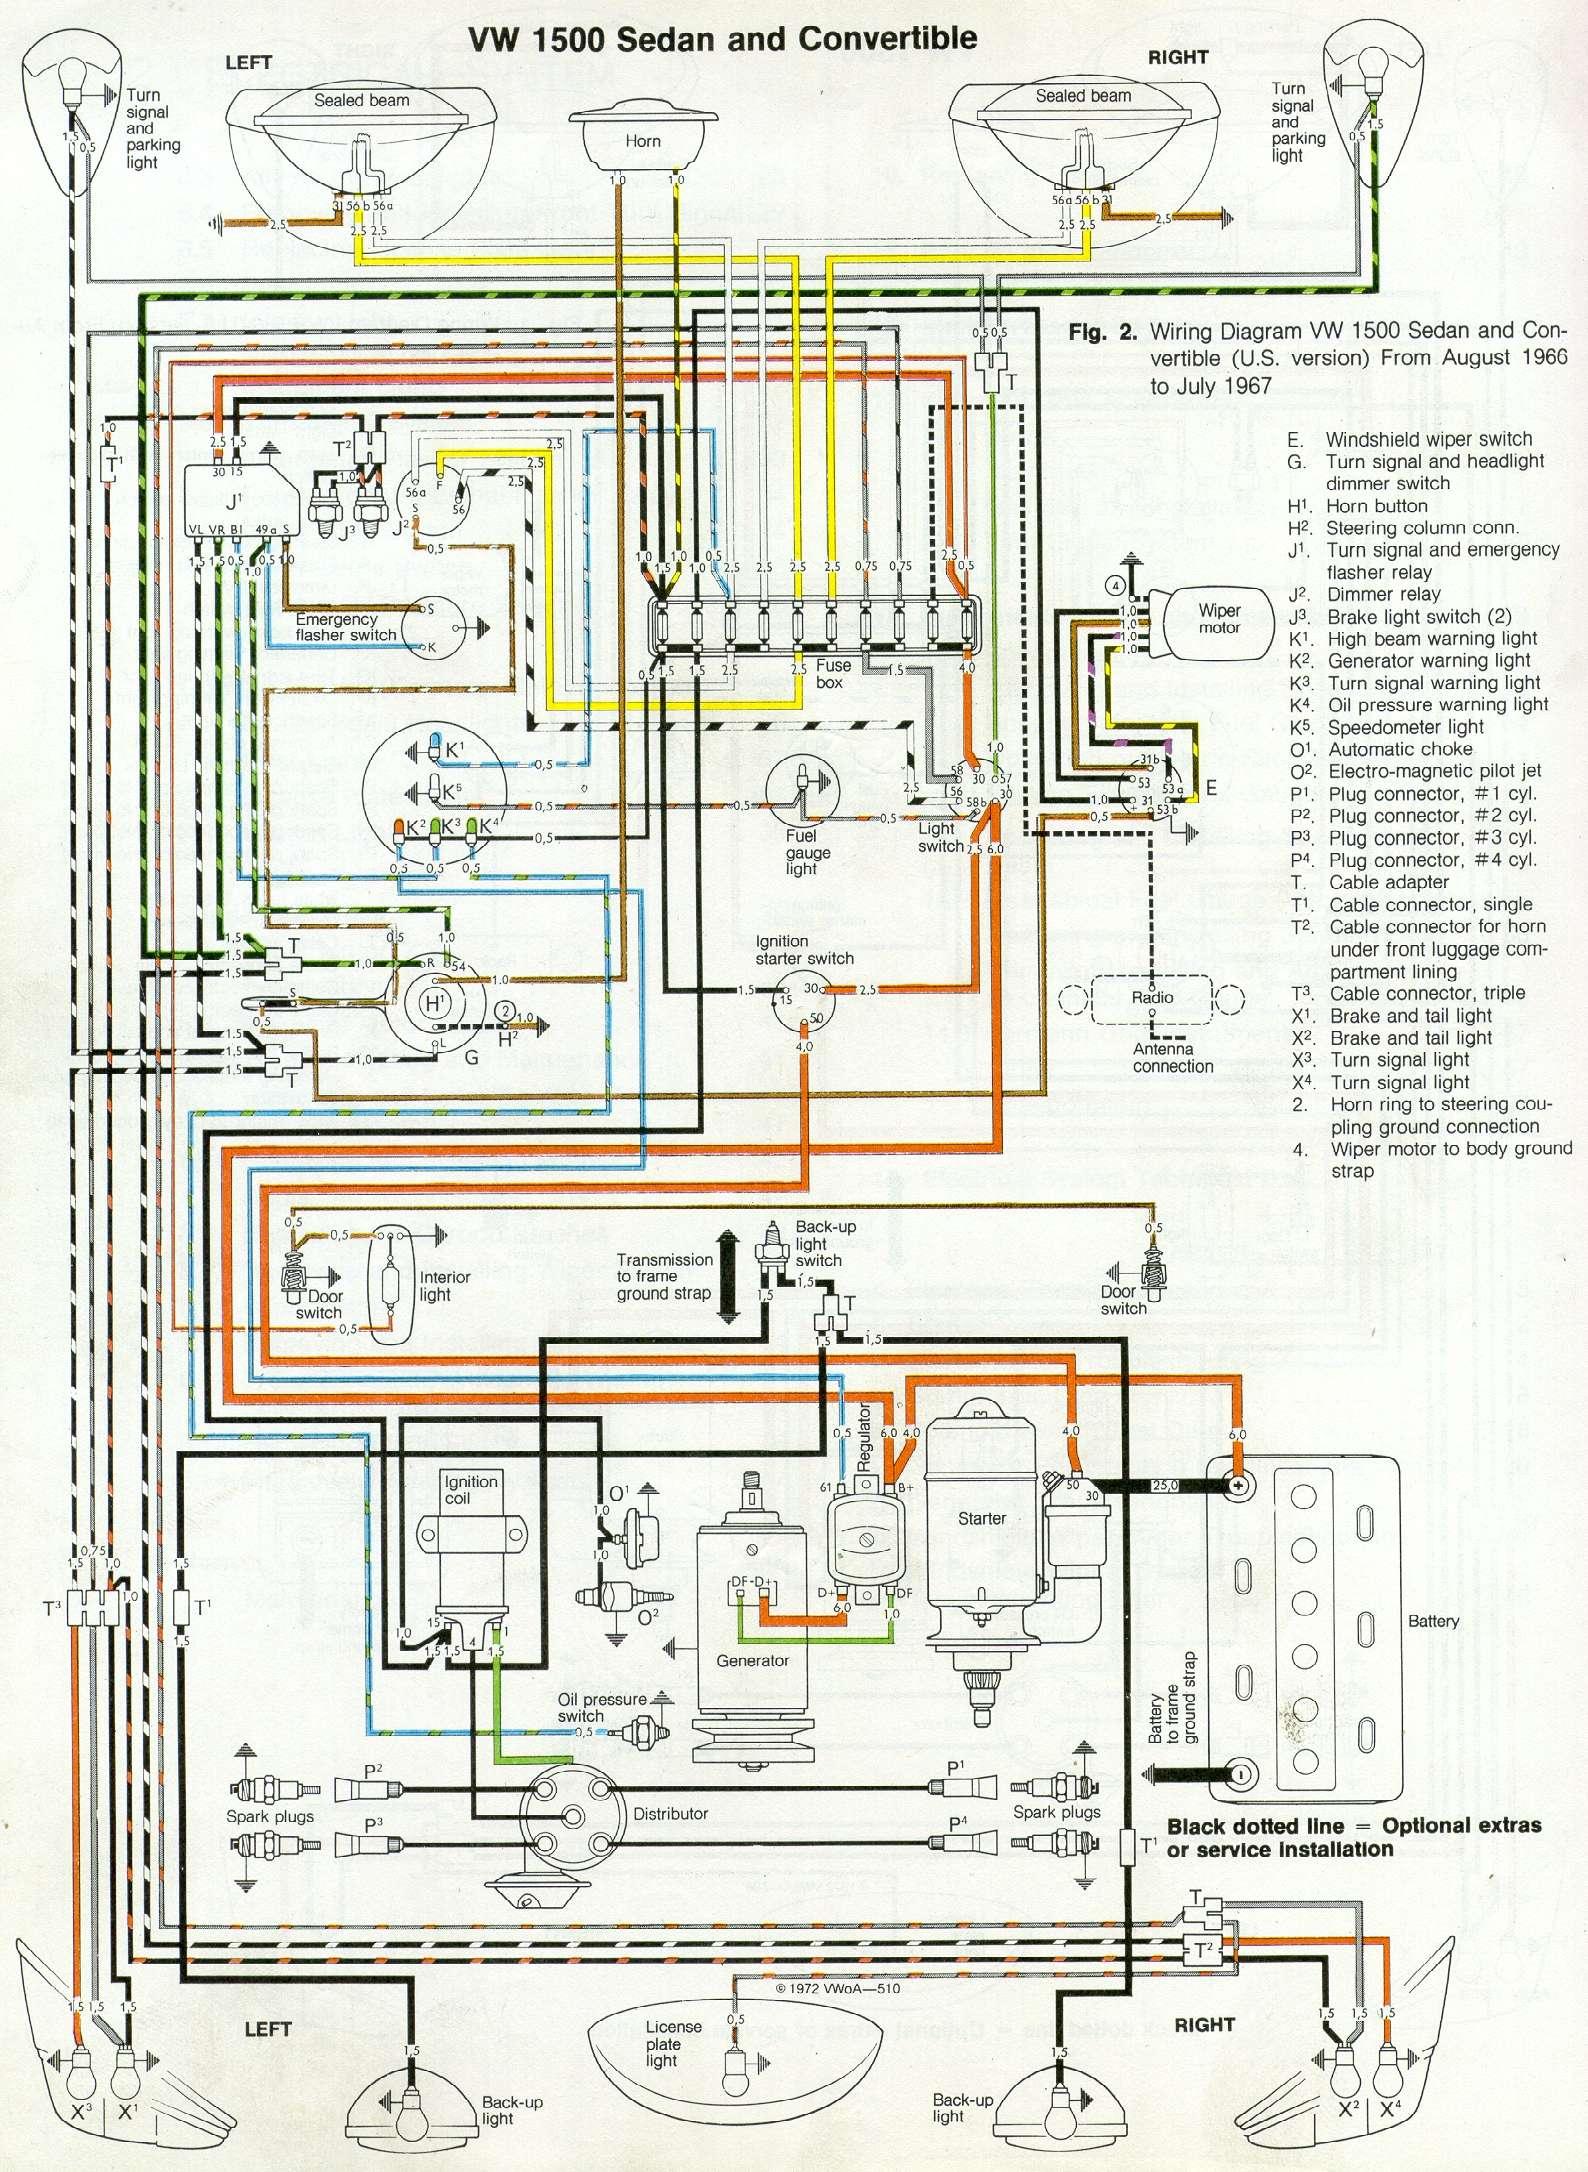 1958 Vw Bus Wiring Diagram Detailed Schematics 1972 Beetle Headlight Schematic Diagrams Harness